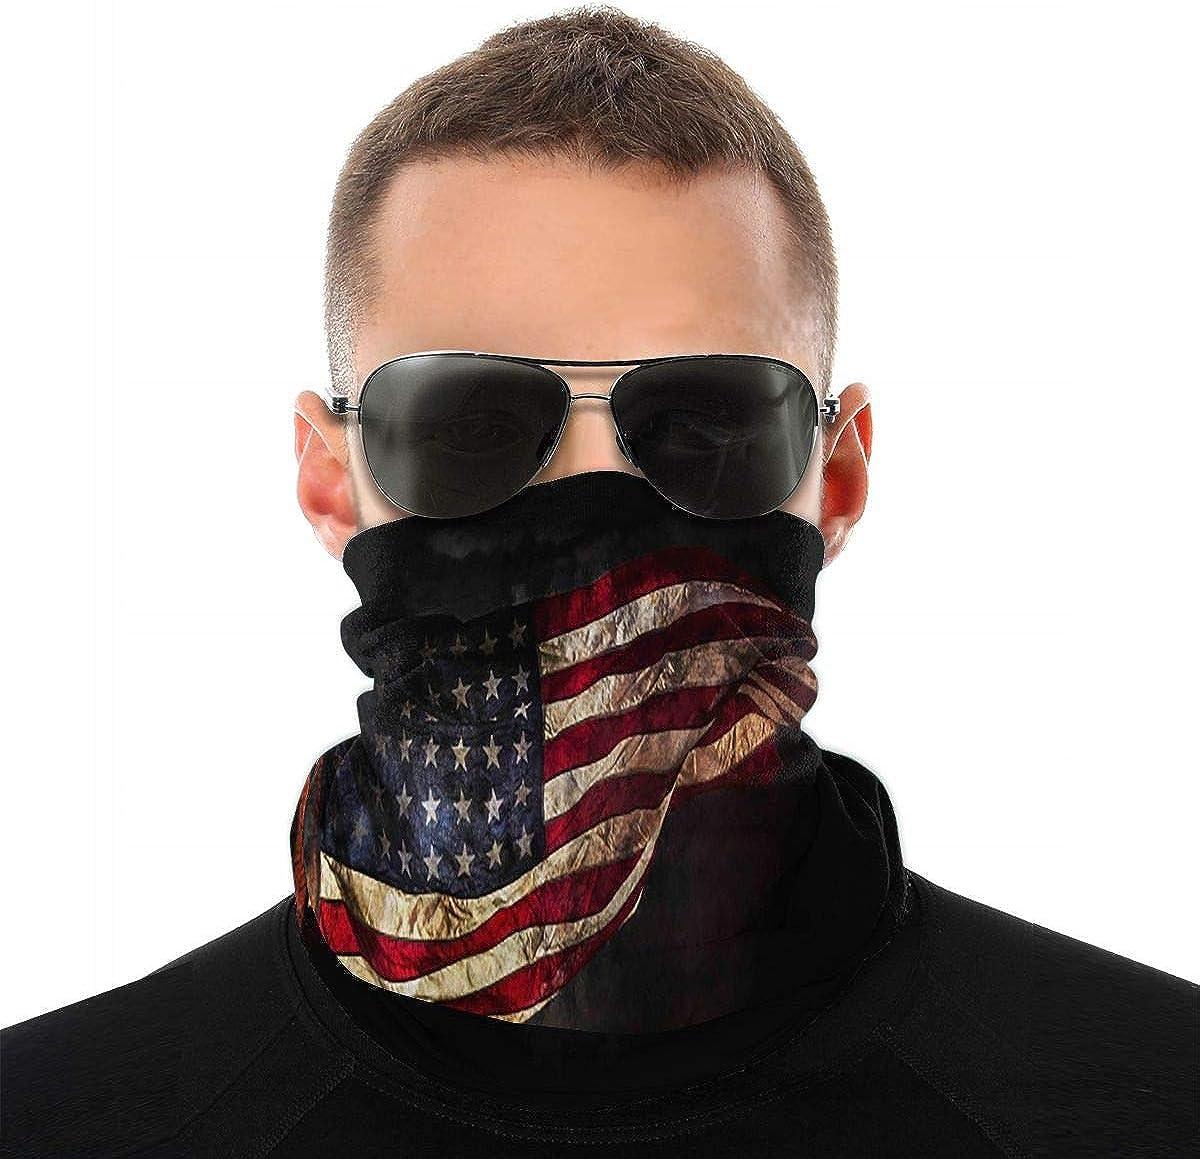 KiuLoam Flying American Flag Seamless Face Mask Bandanas Neck Gaiter for Men and Women, Multifunction Headband Scarf for Dust, Outdoors, Sports